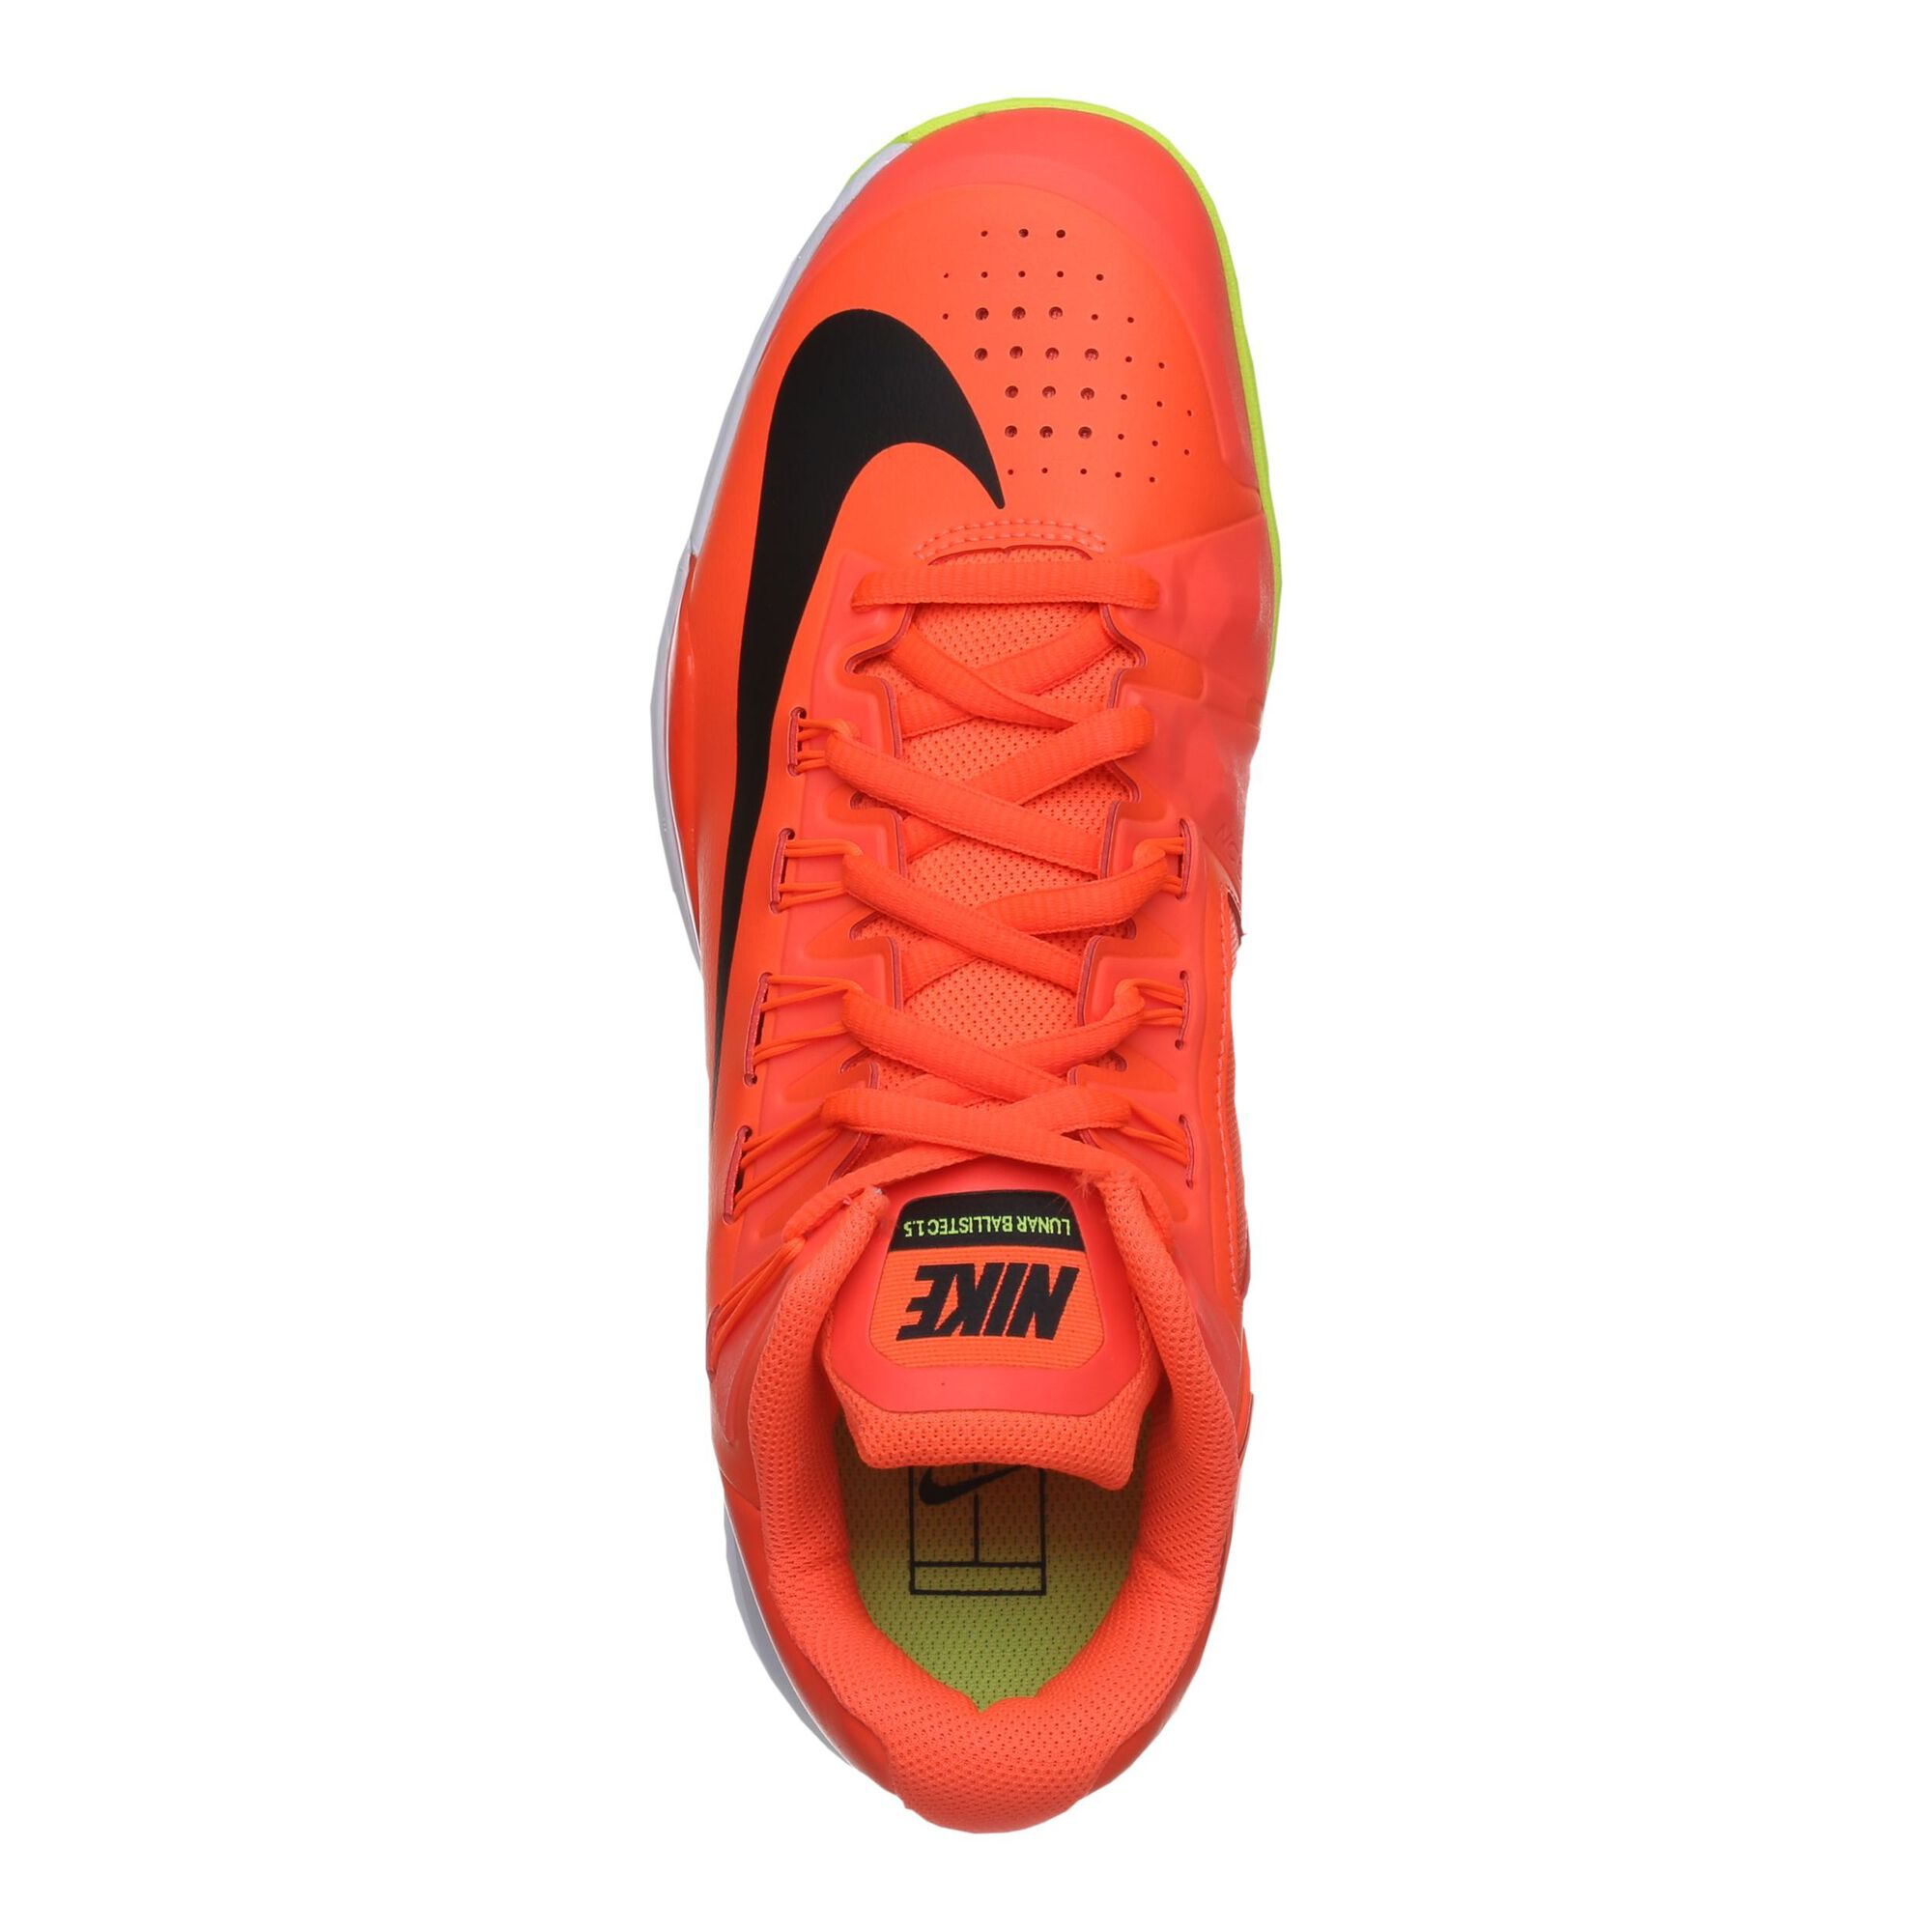 b121394e30 ... Nike · Nike · Nike · Nike · Nike · Nike. Lunar Ballistec 1.5 ...